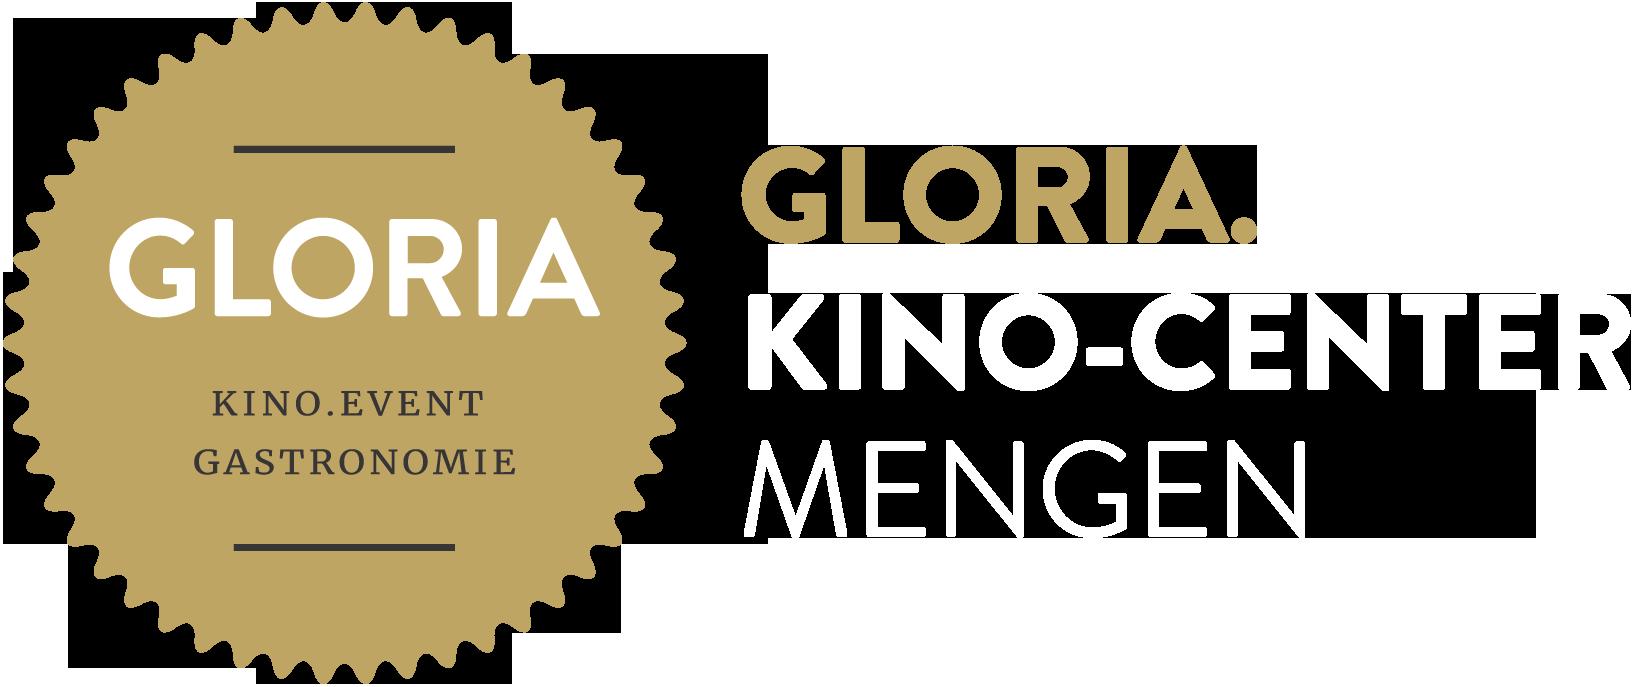 GLORIA.KINO-CENTER